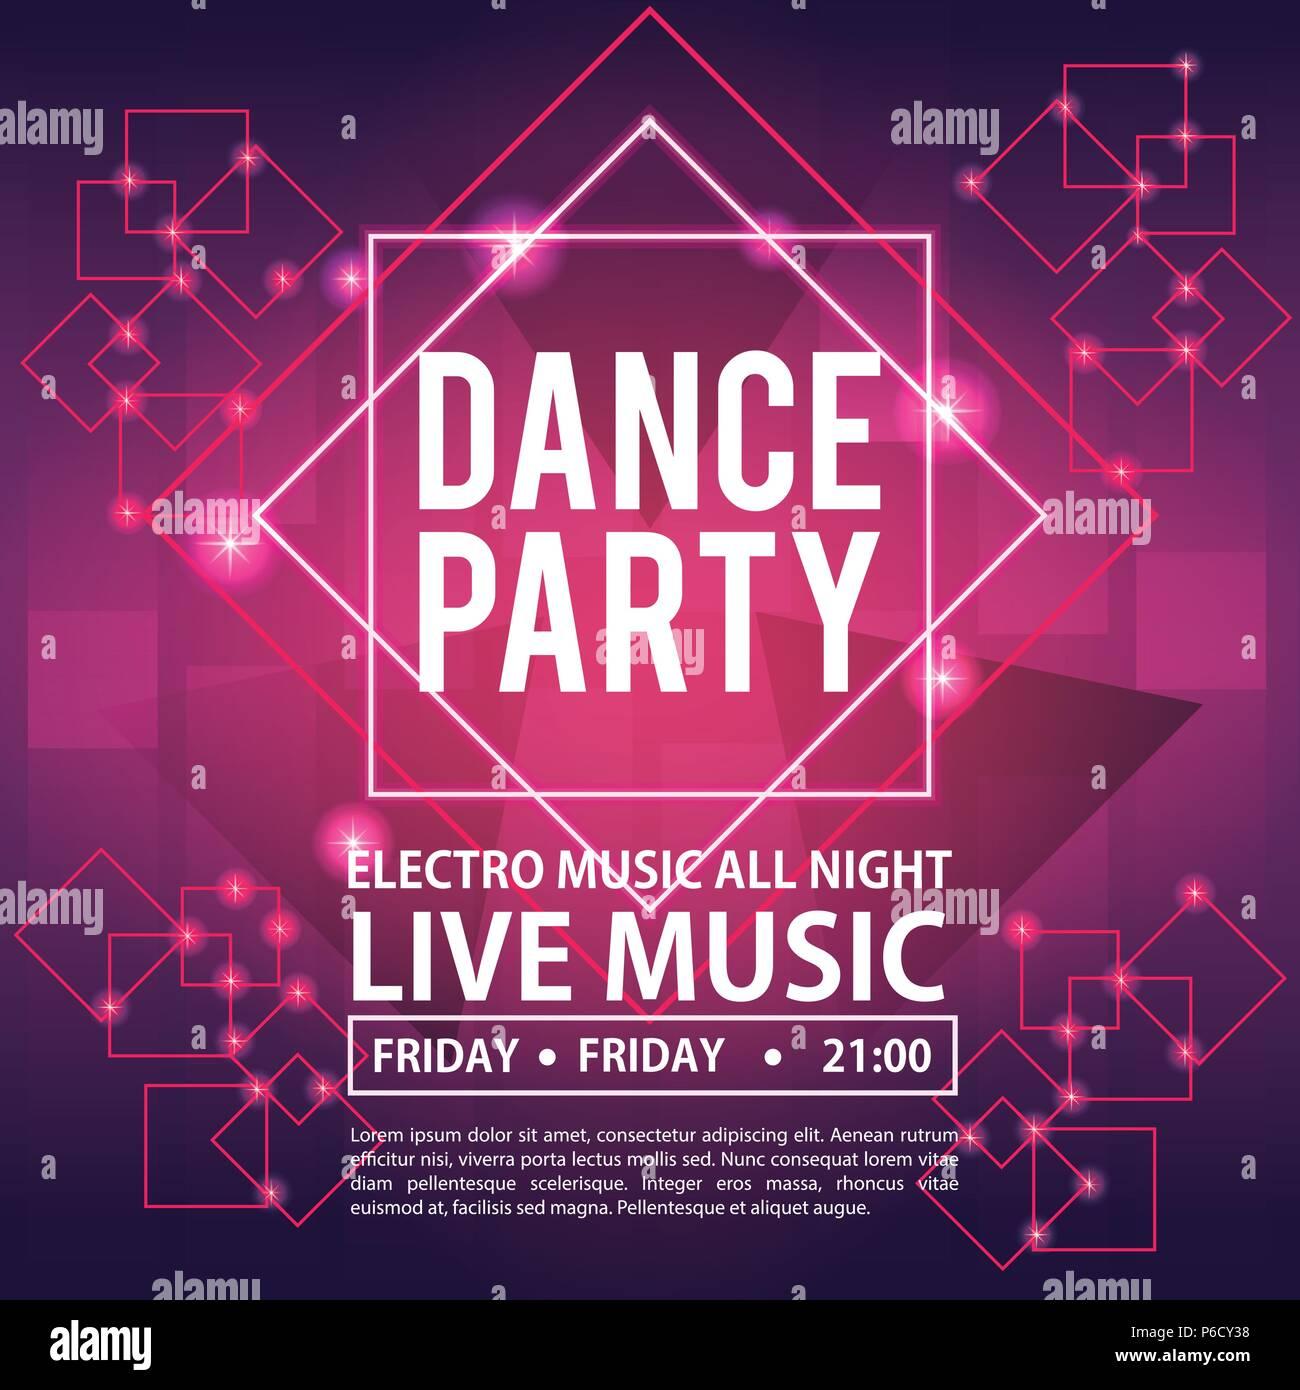 Dance Party Invitation Card Vector Illustration Graphic